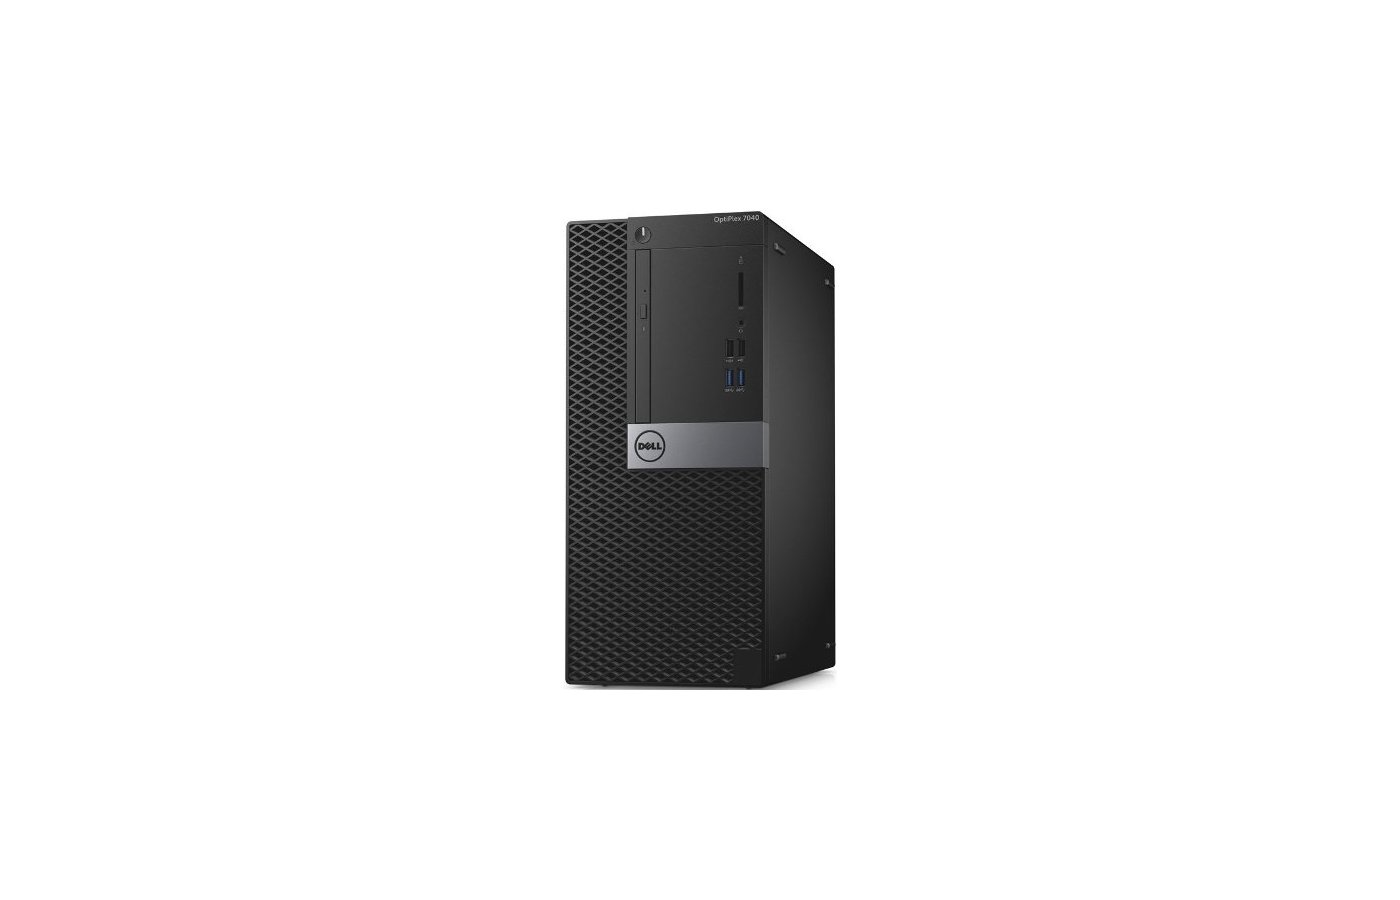 Системный блок Dell OptiPlex 7040 MT /7040-0057/